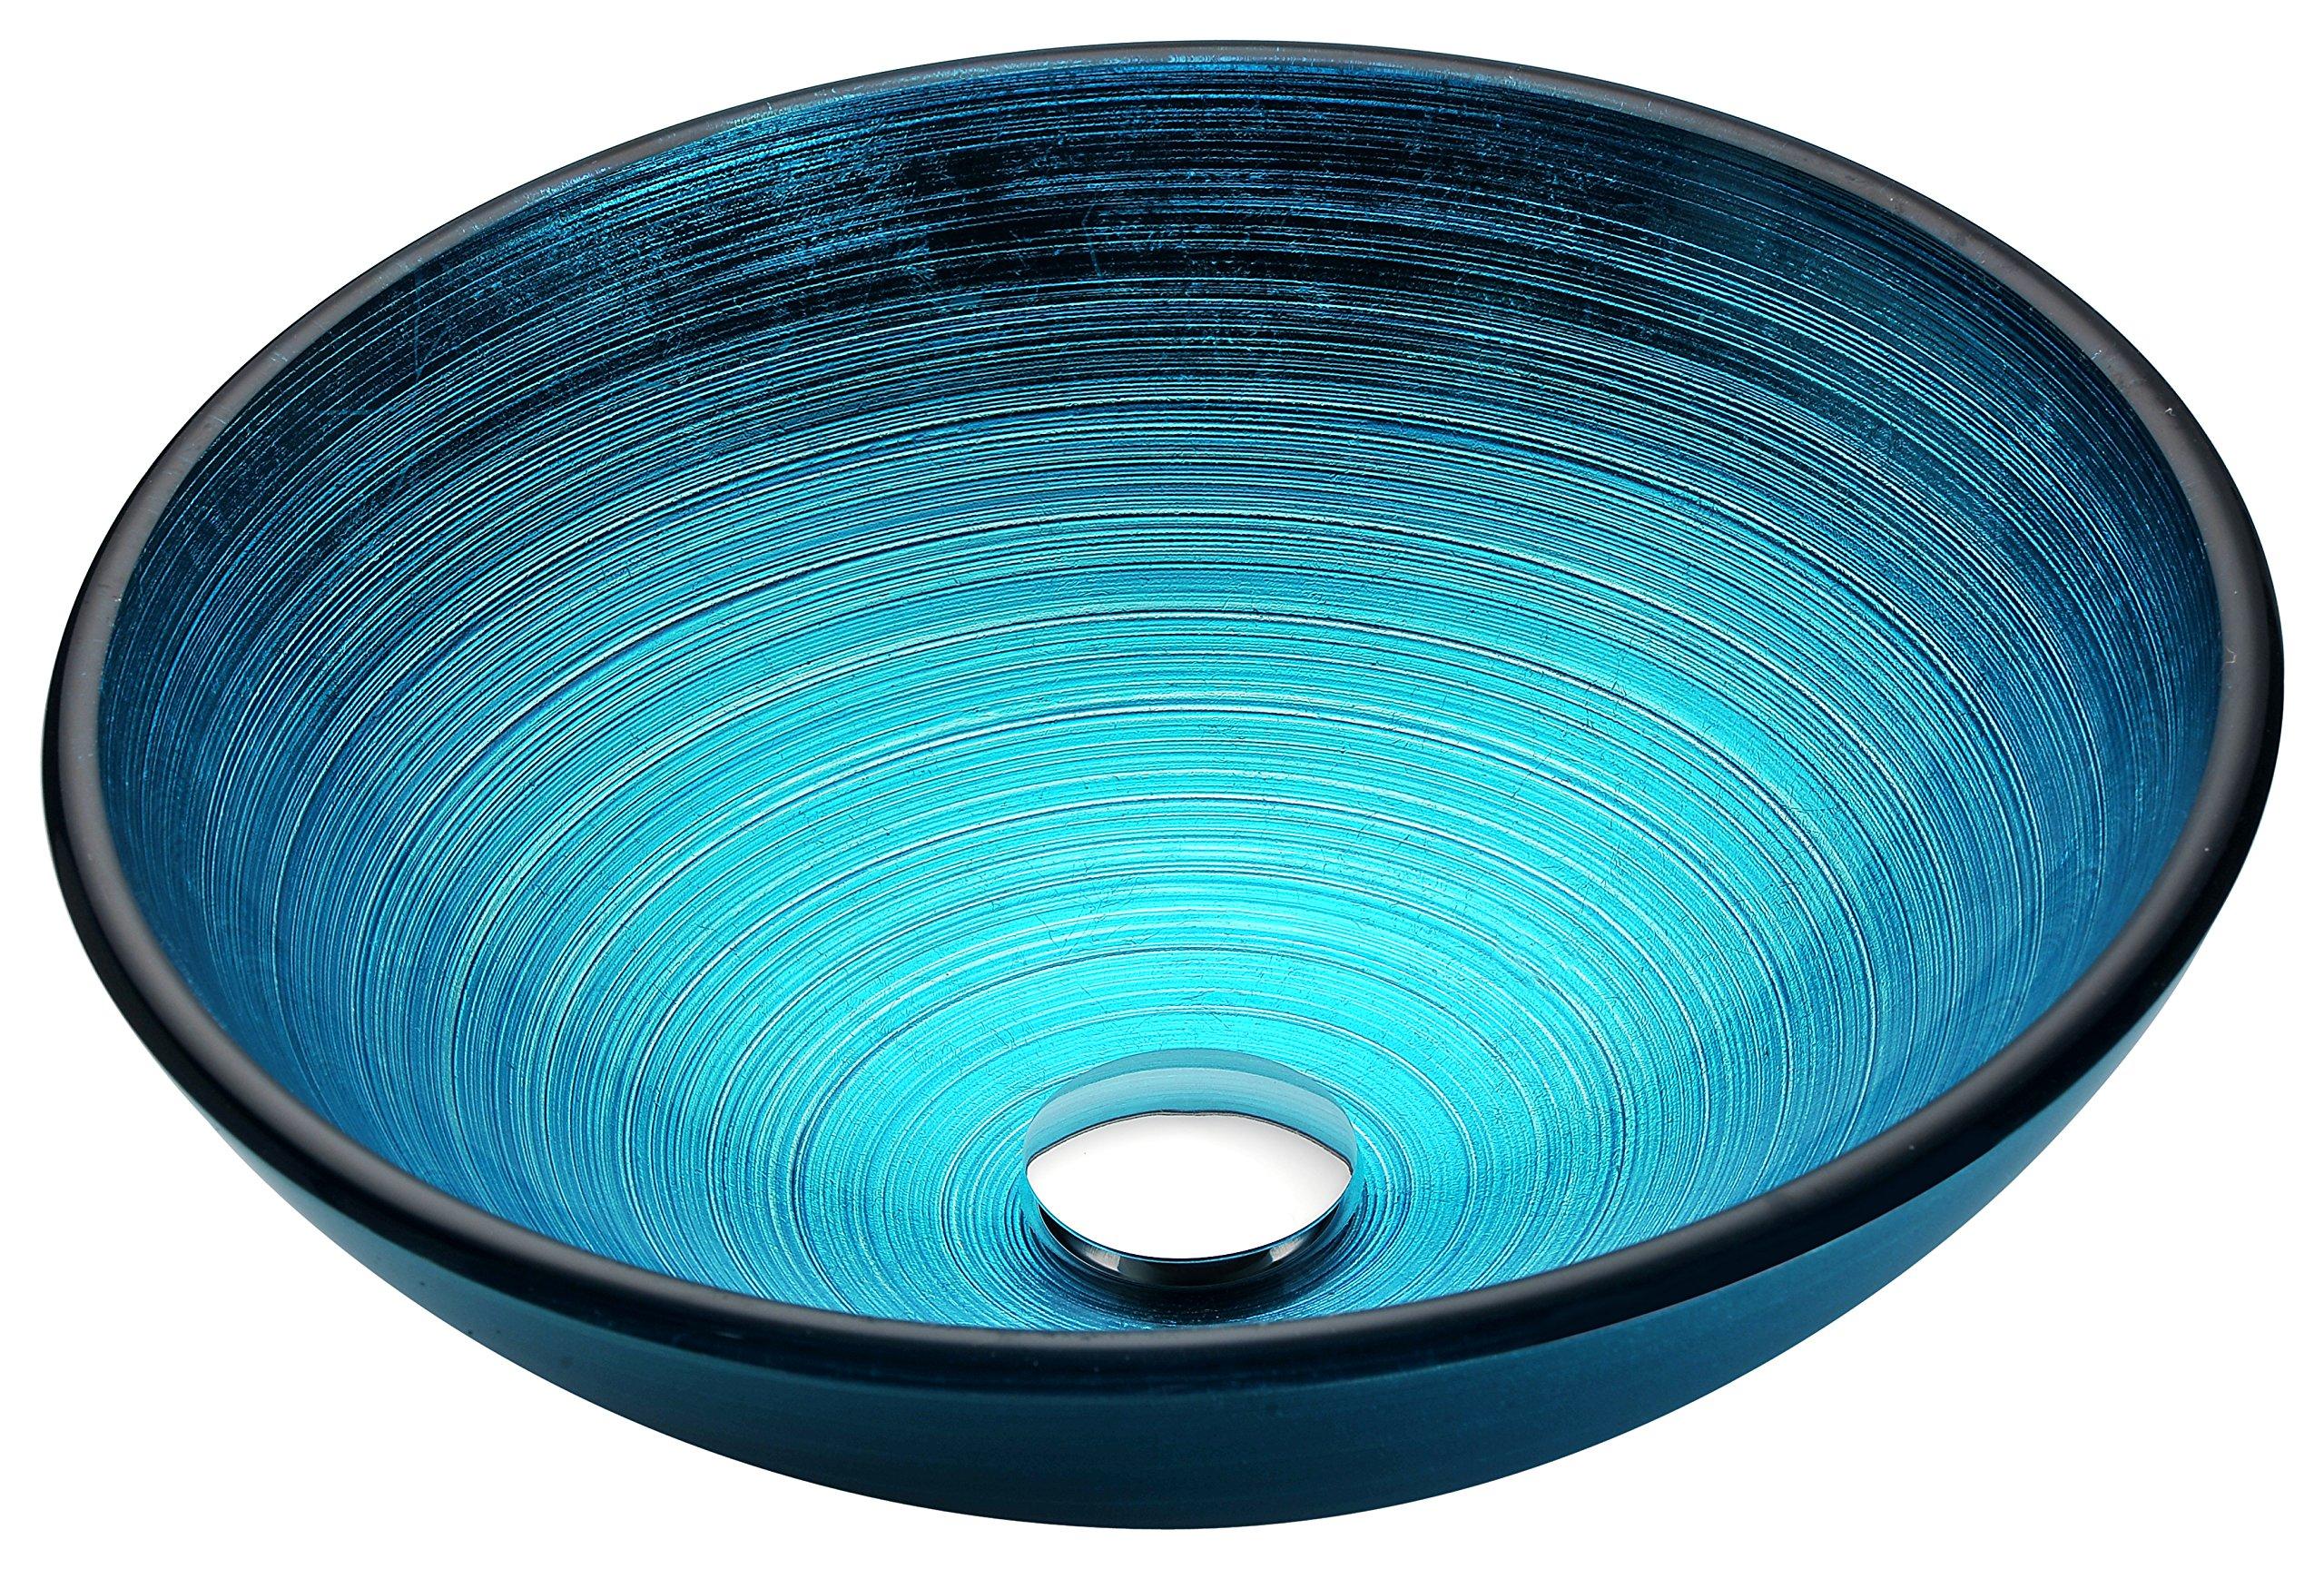 Tempered Glass Vessel Sink - Lustrous Blue - Enti Series LS-AZ045 - ANZZI